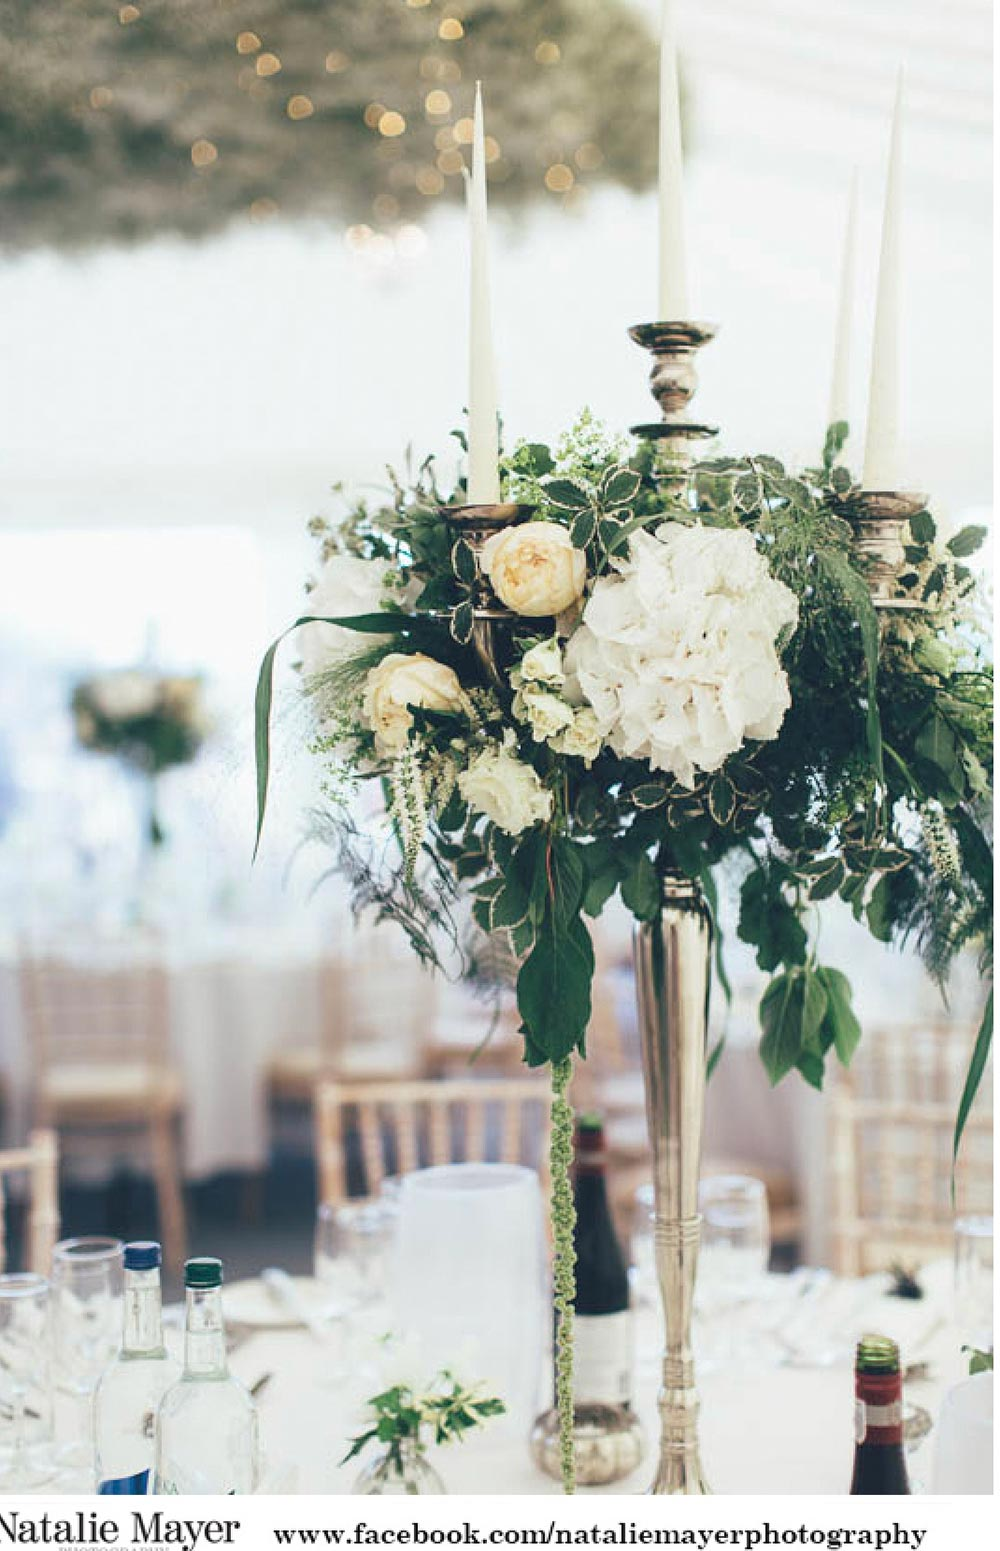 2-wedding-flowers-wilde-thyme-candleabra-hydrangeas-garden-roses-natalie-mayer.jpg